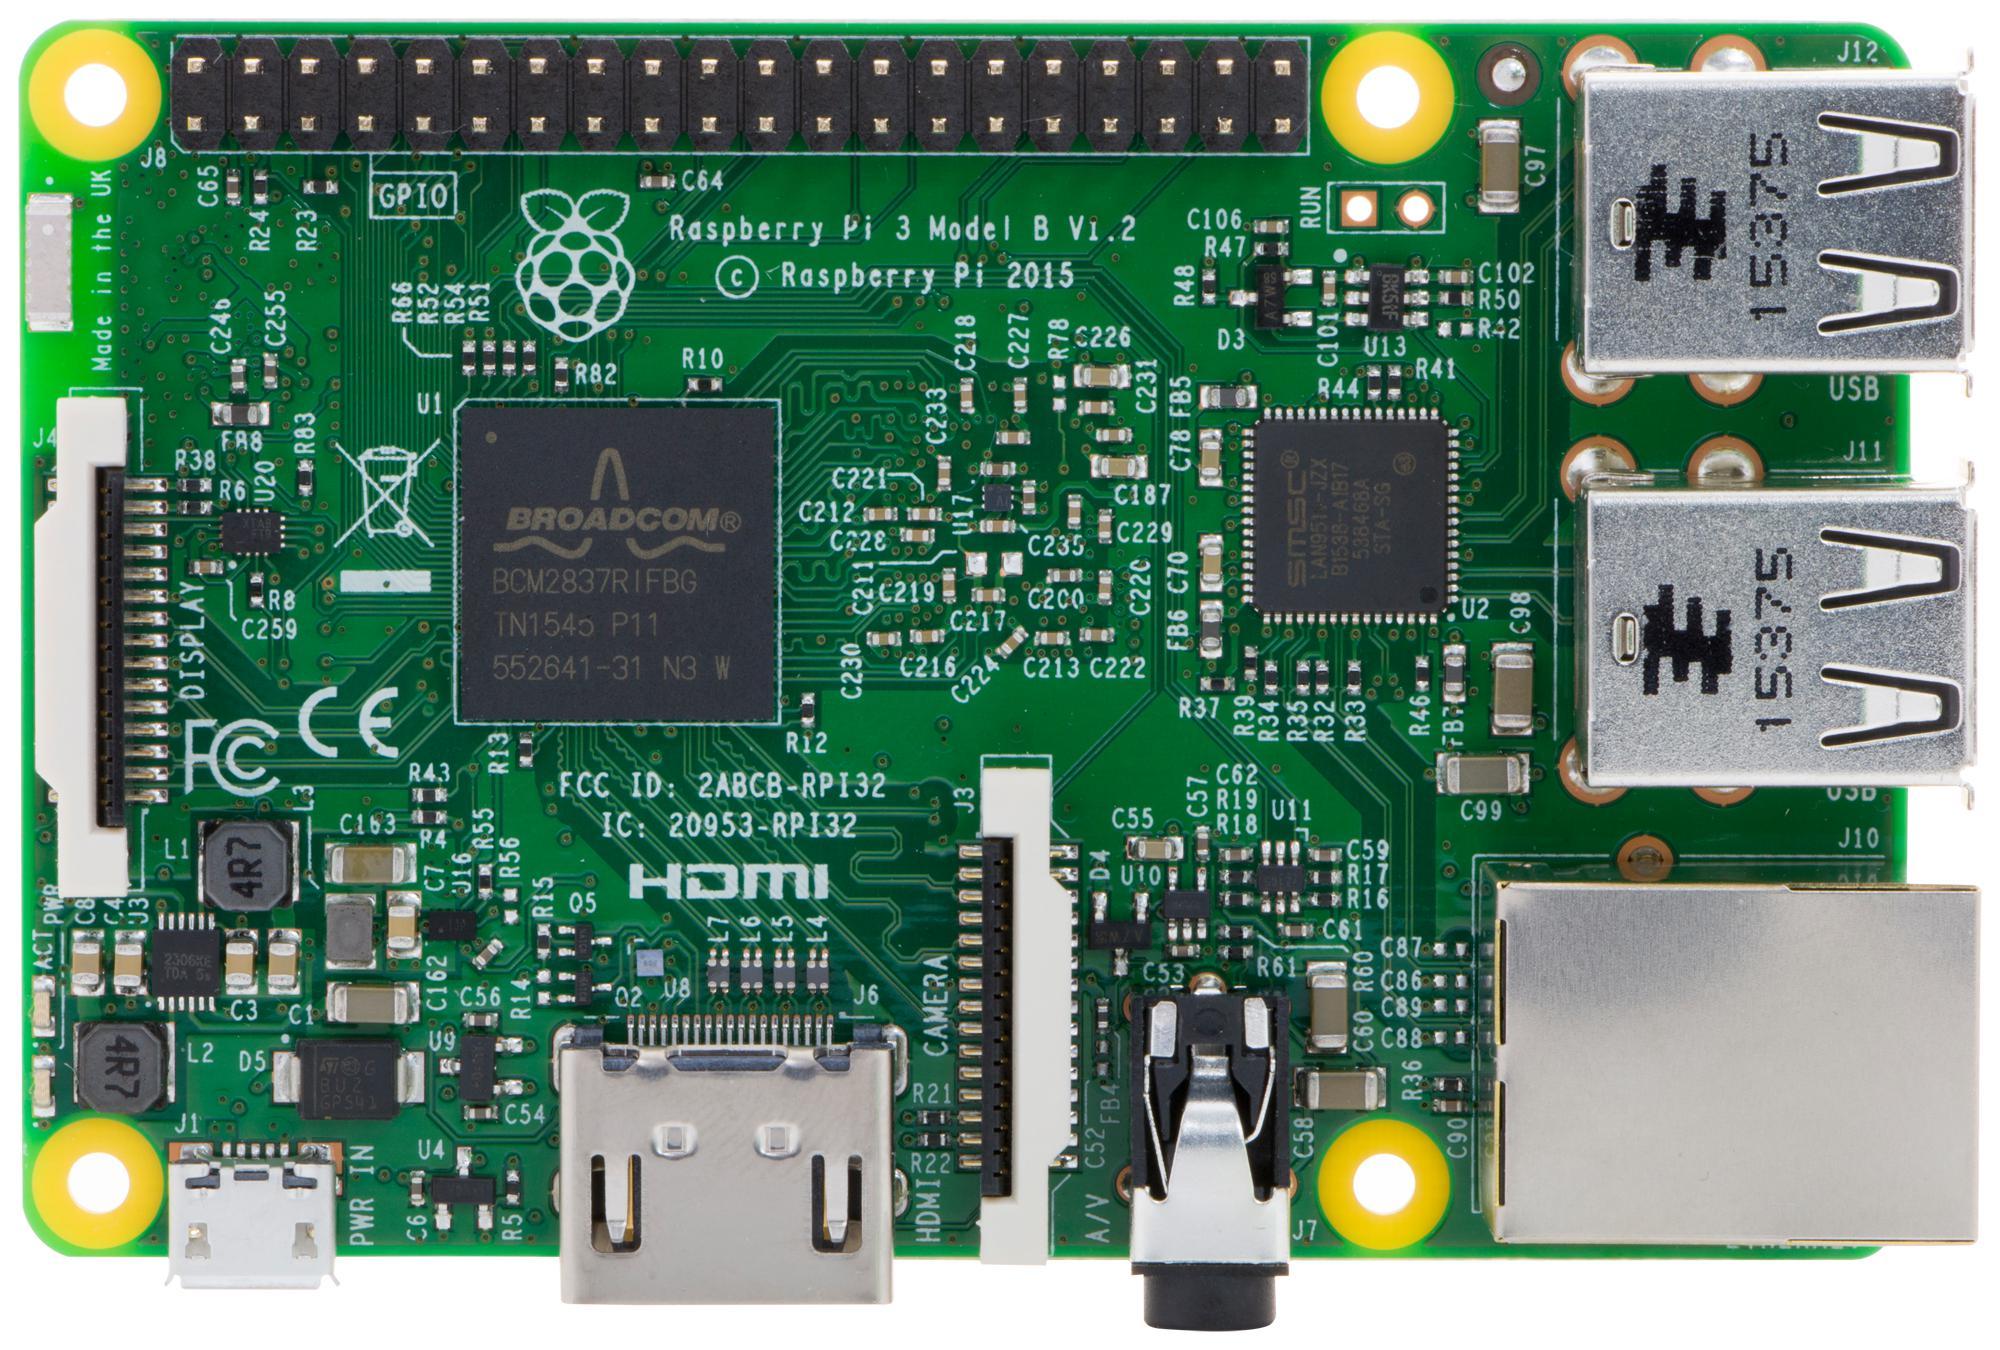 Raspberry pi 3 model b image download